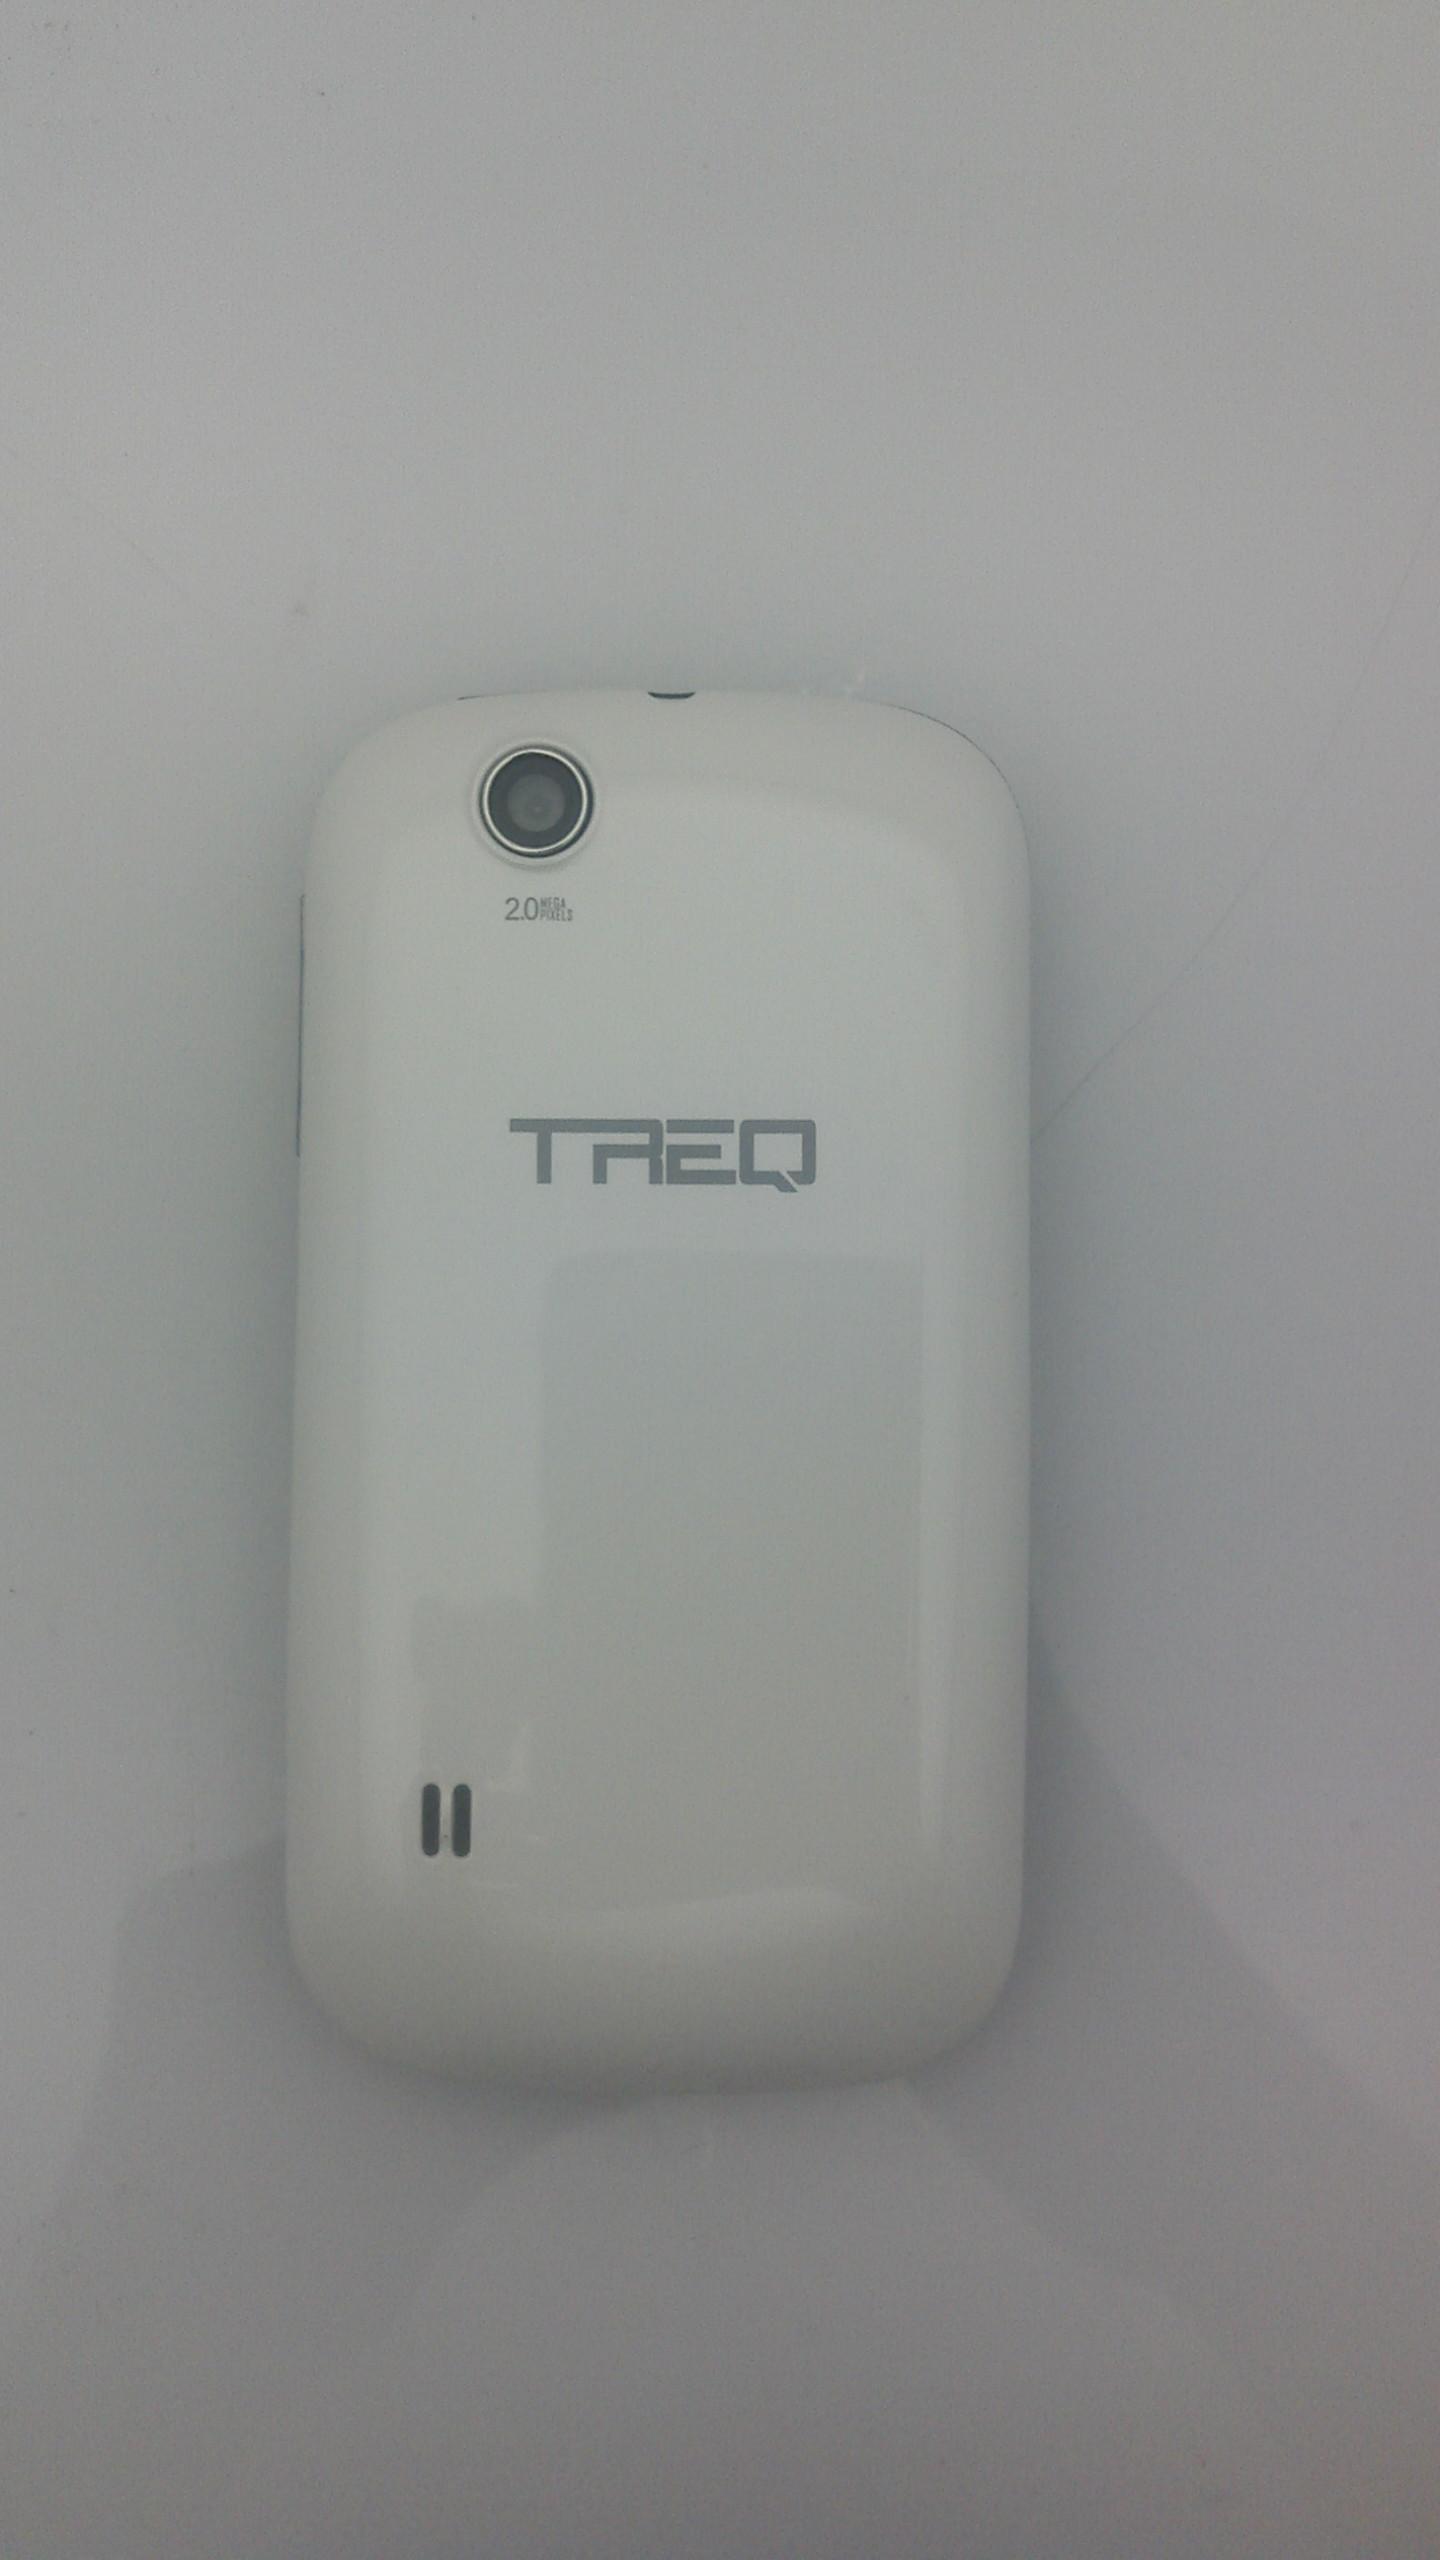 harga Promo Handphone 3G Murah Tokopedia.com